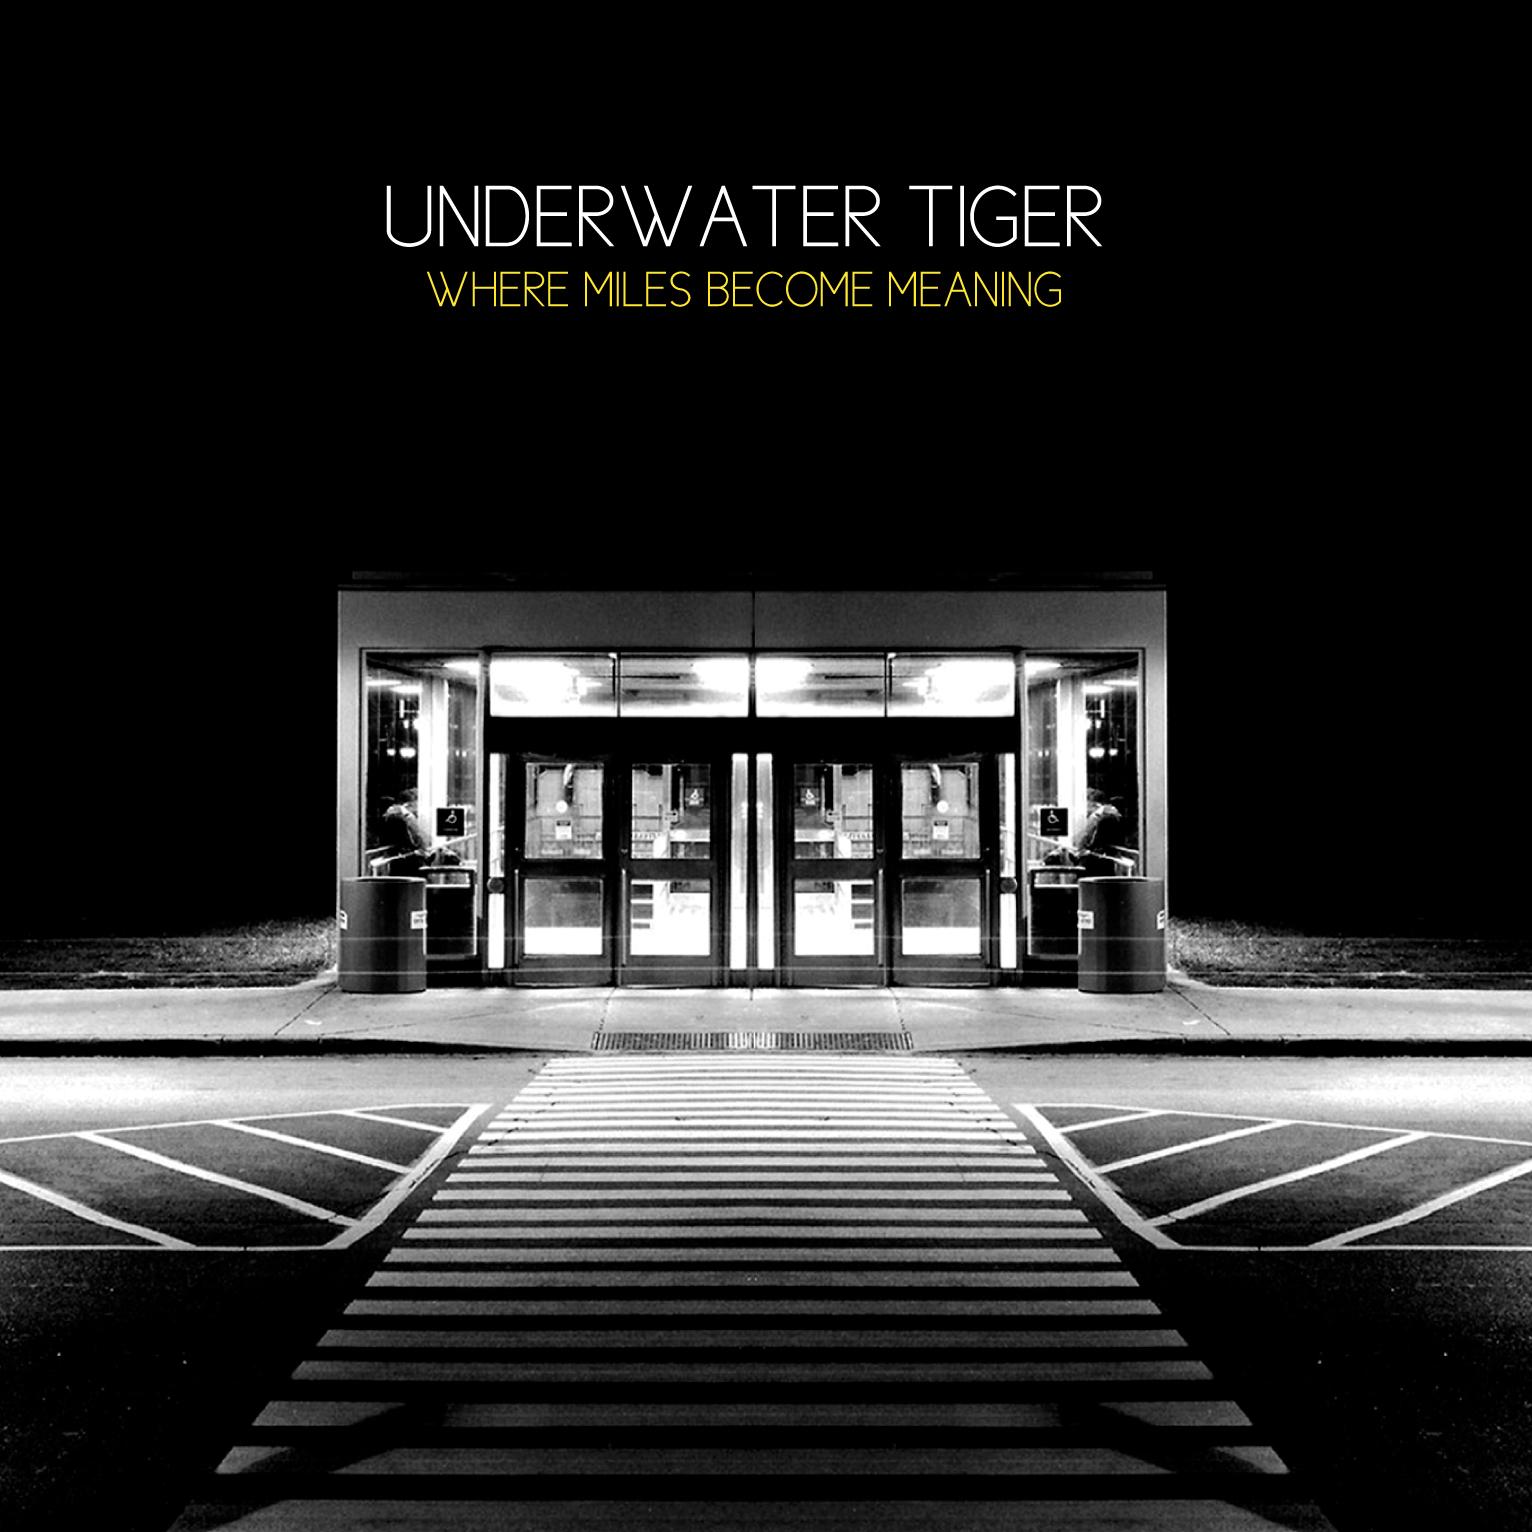 Car Underwater Lyrics Meaning